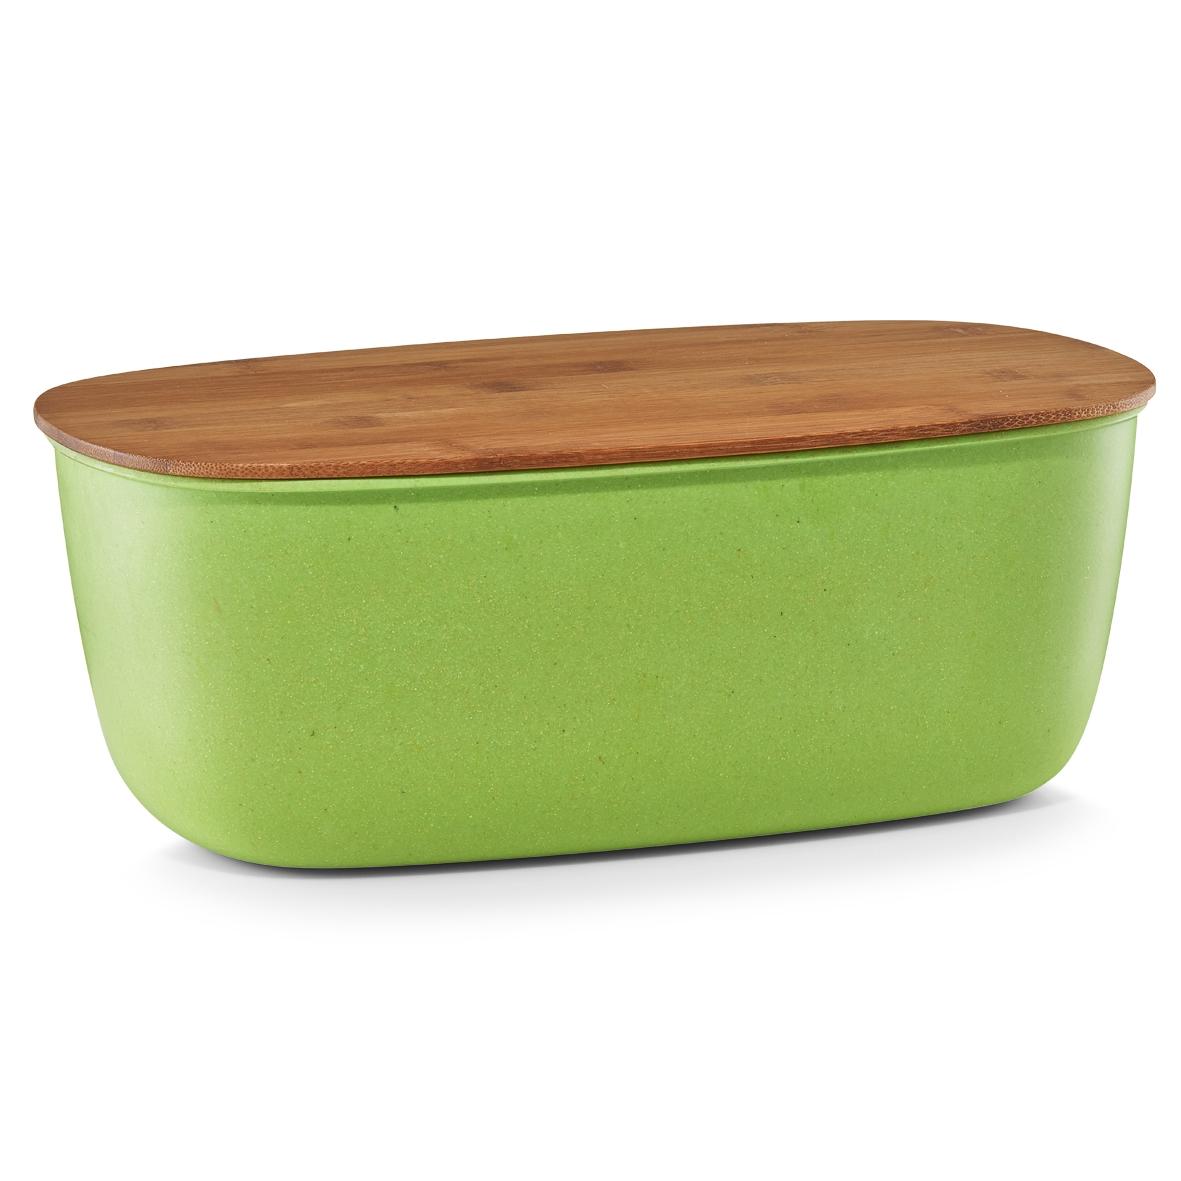 Cutie pentru paine Green, fibra de bambus, l35,4xA20xH13 cm imagine